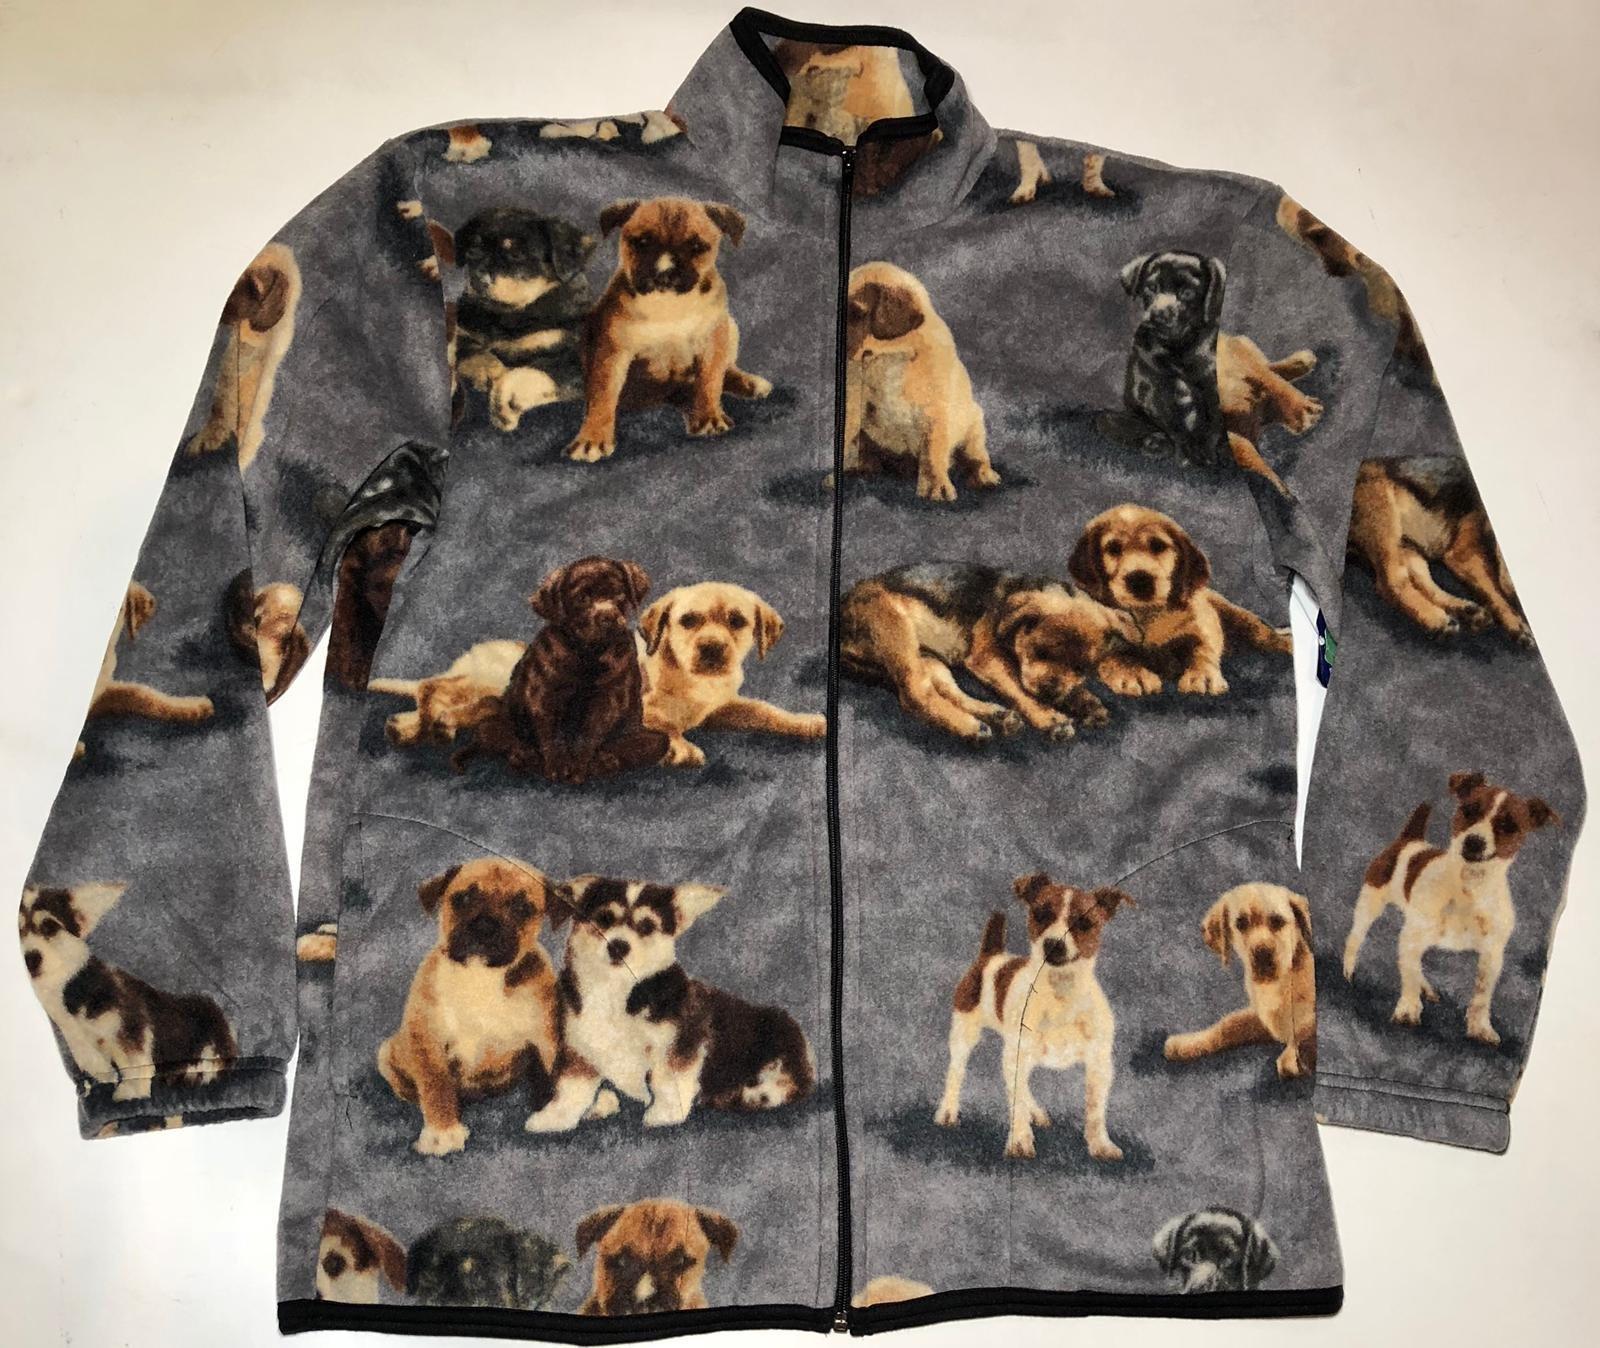 Dogs Cute Puppies Gray Fleece Beagle Beagles Jacket Best Friend